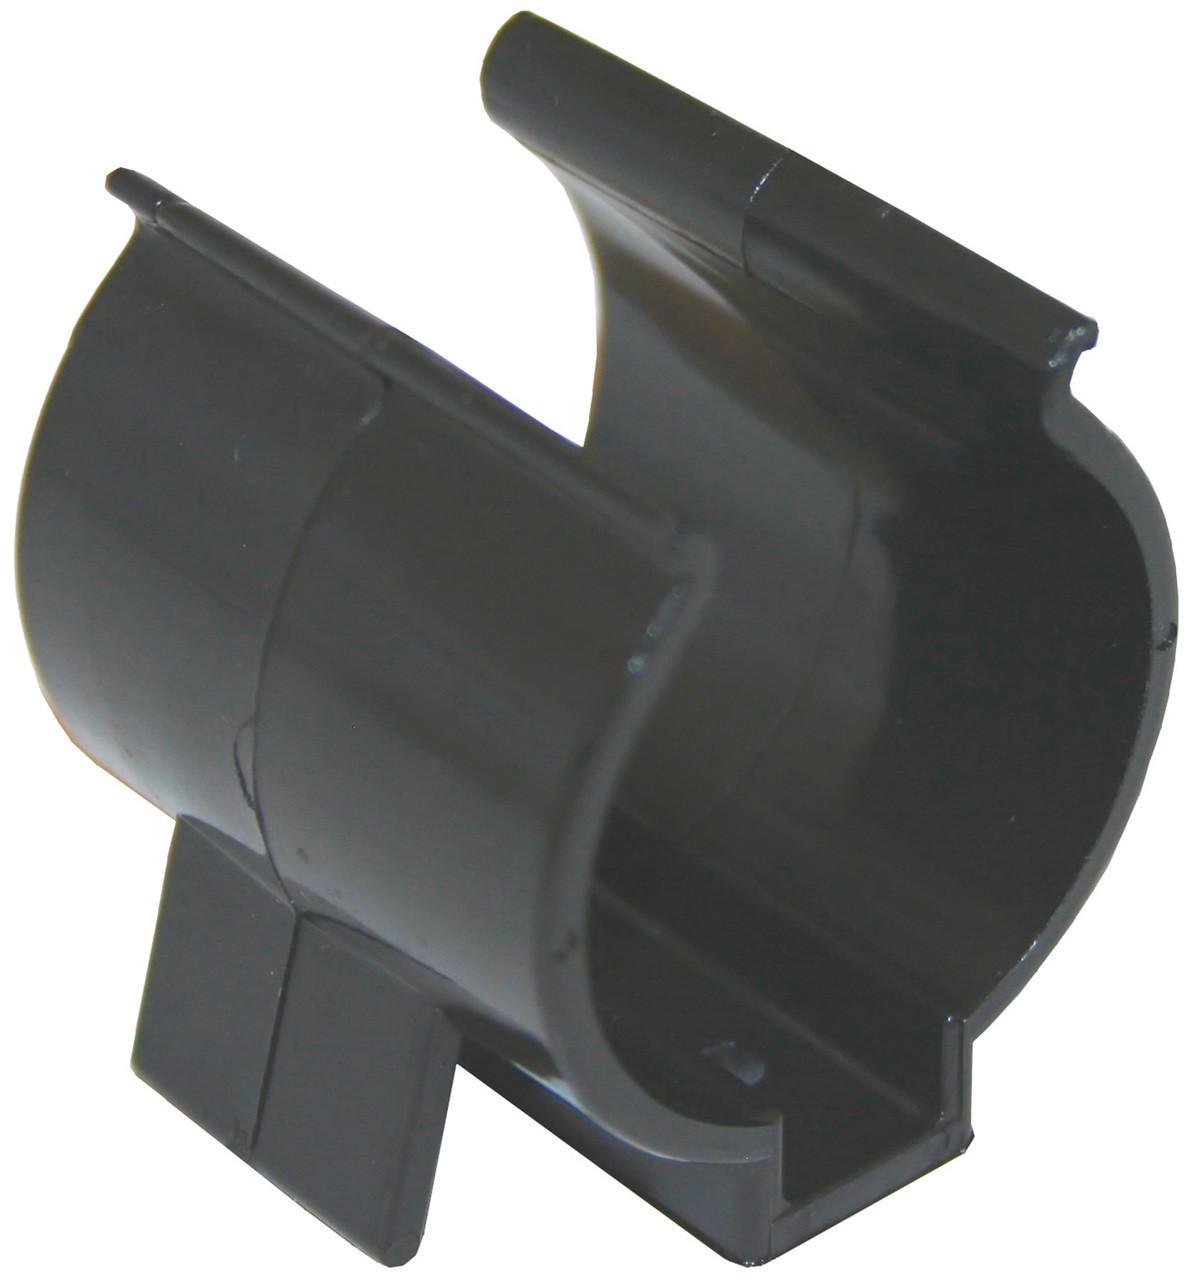 Adjustable Tube Clips 25mm - 35mm 2pack